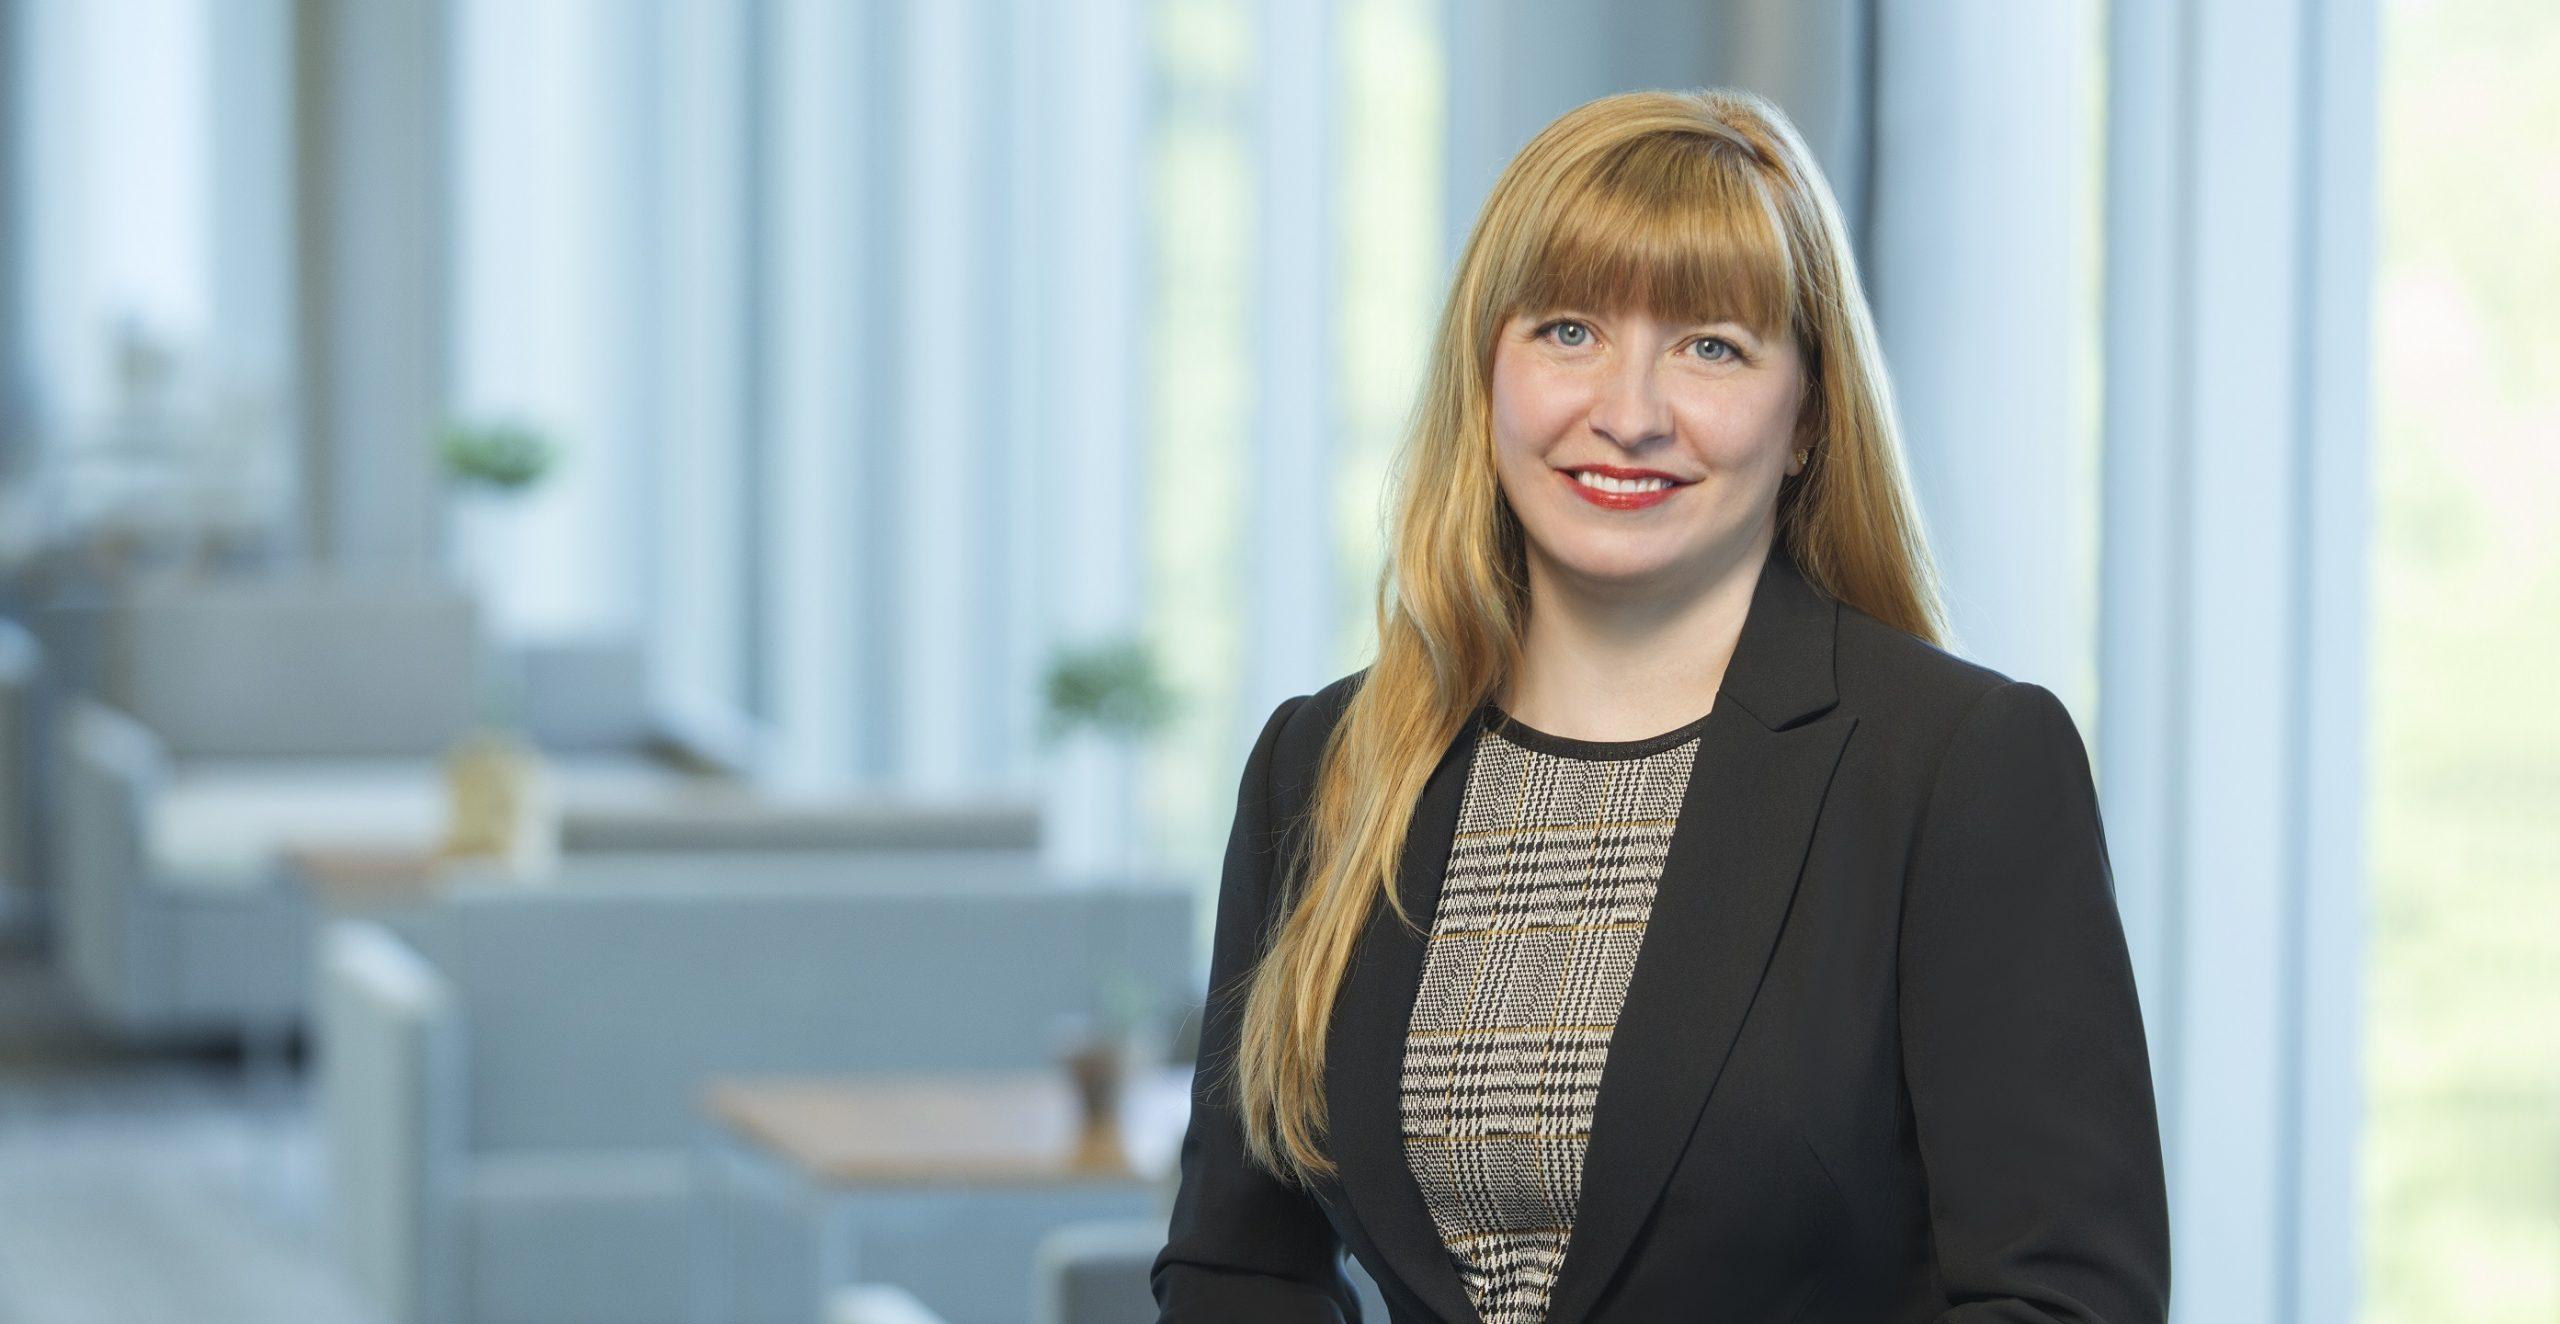 Jennifer Styron, CFO and Executive Vice President, 40 Under 40 Honoree